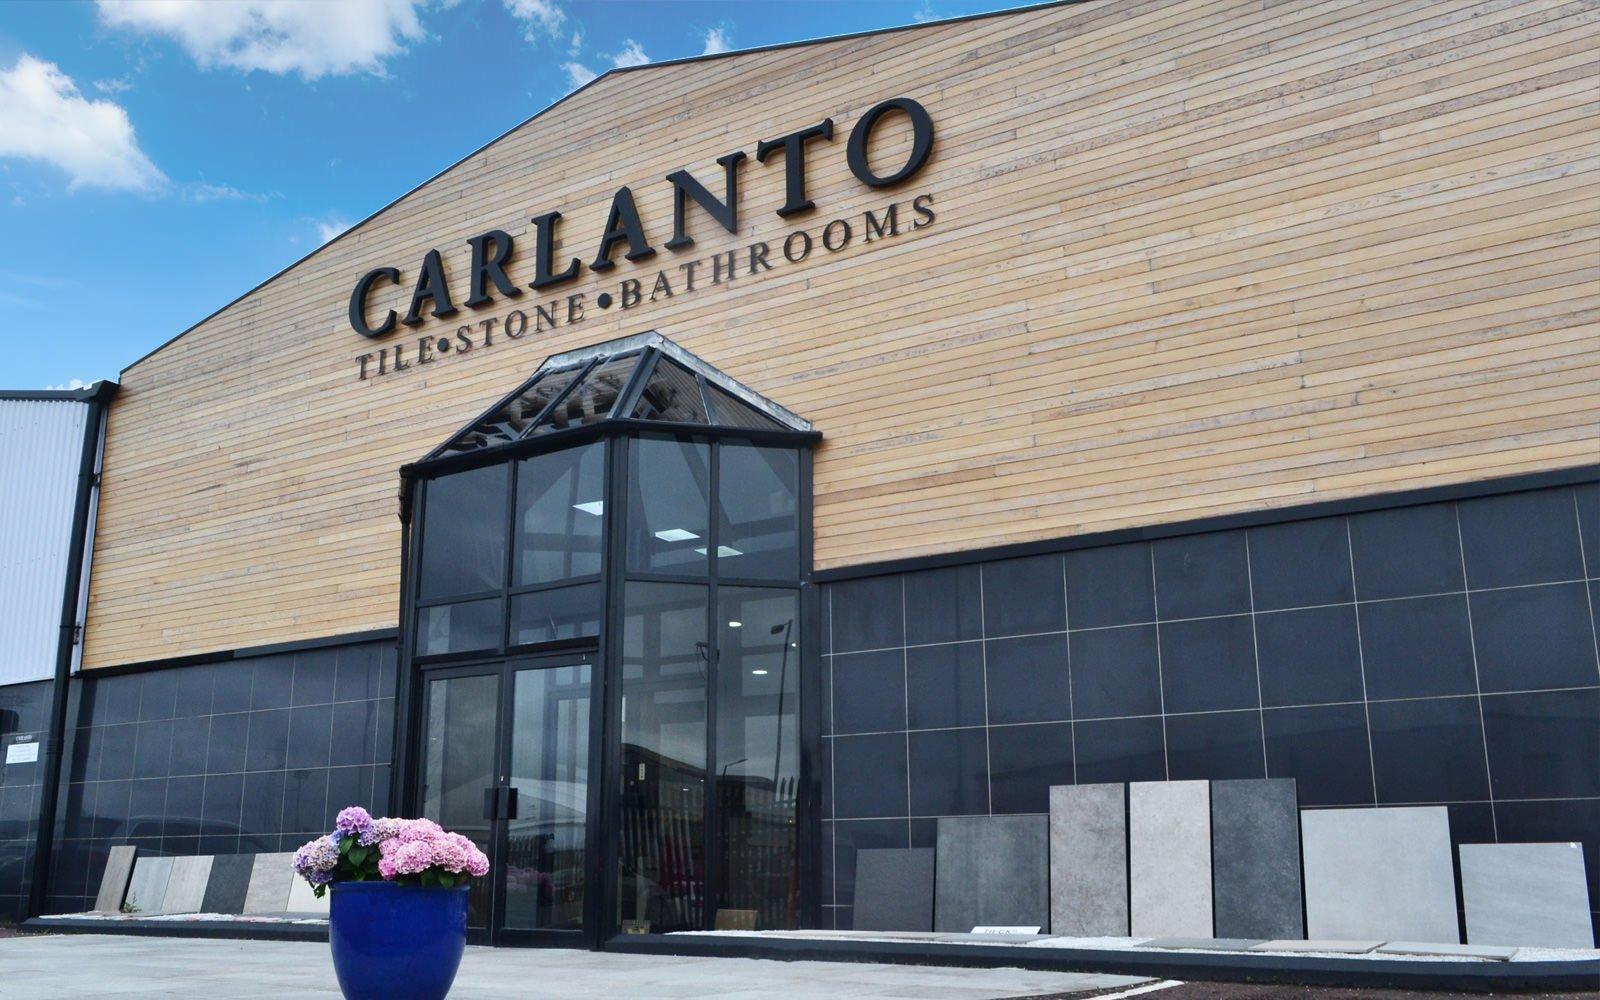 Carlanto Tiles and Bathrooms Belfast Showroom